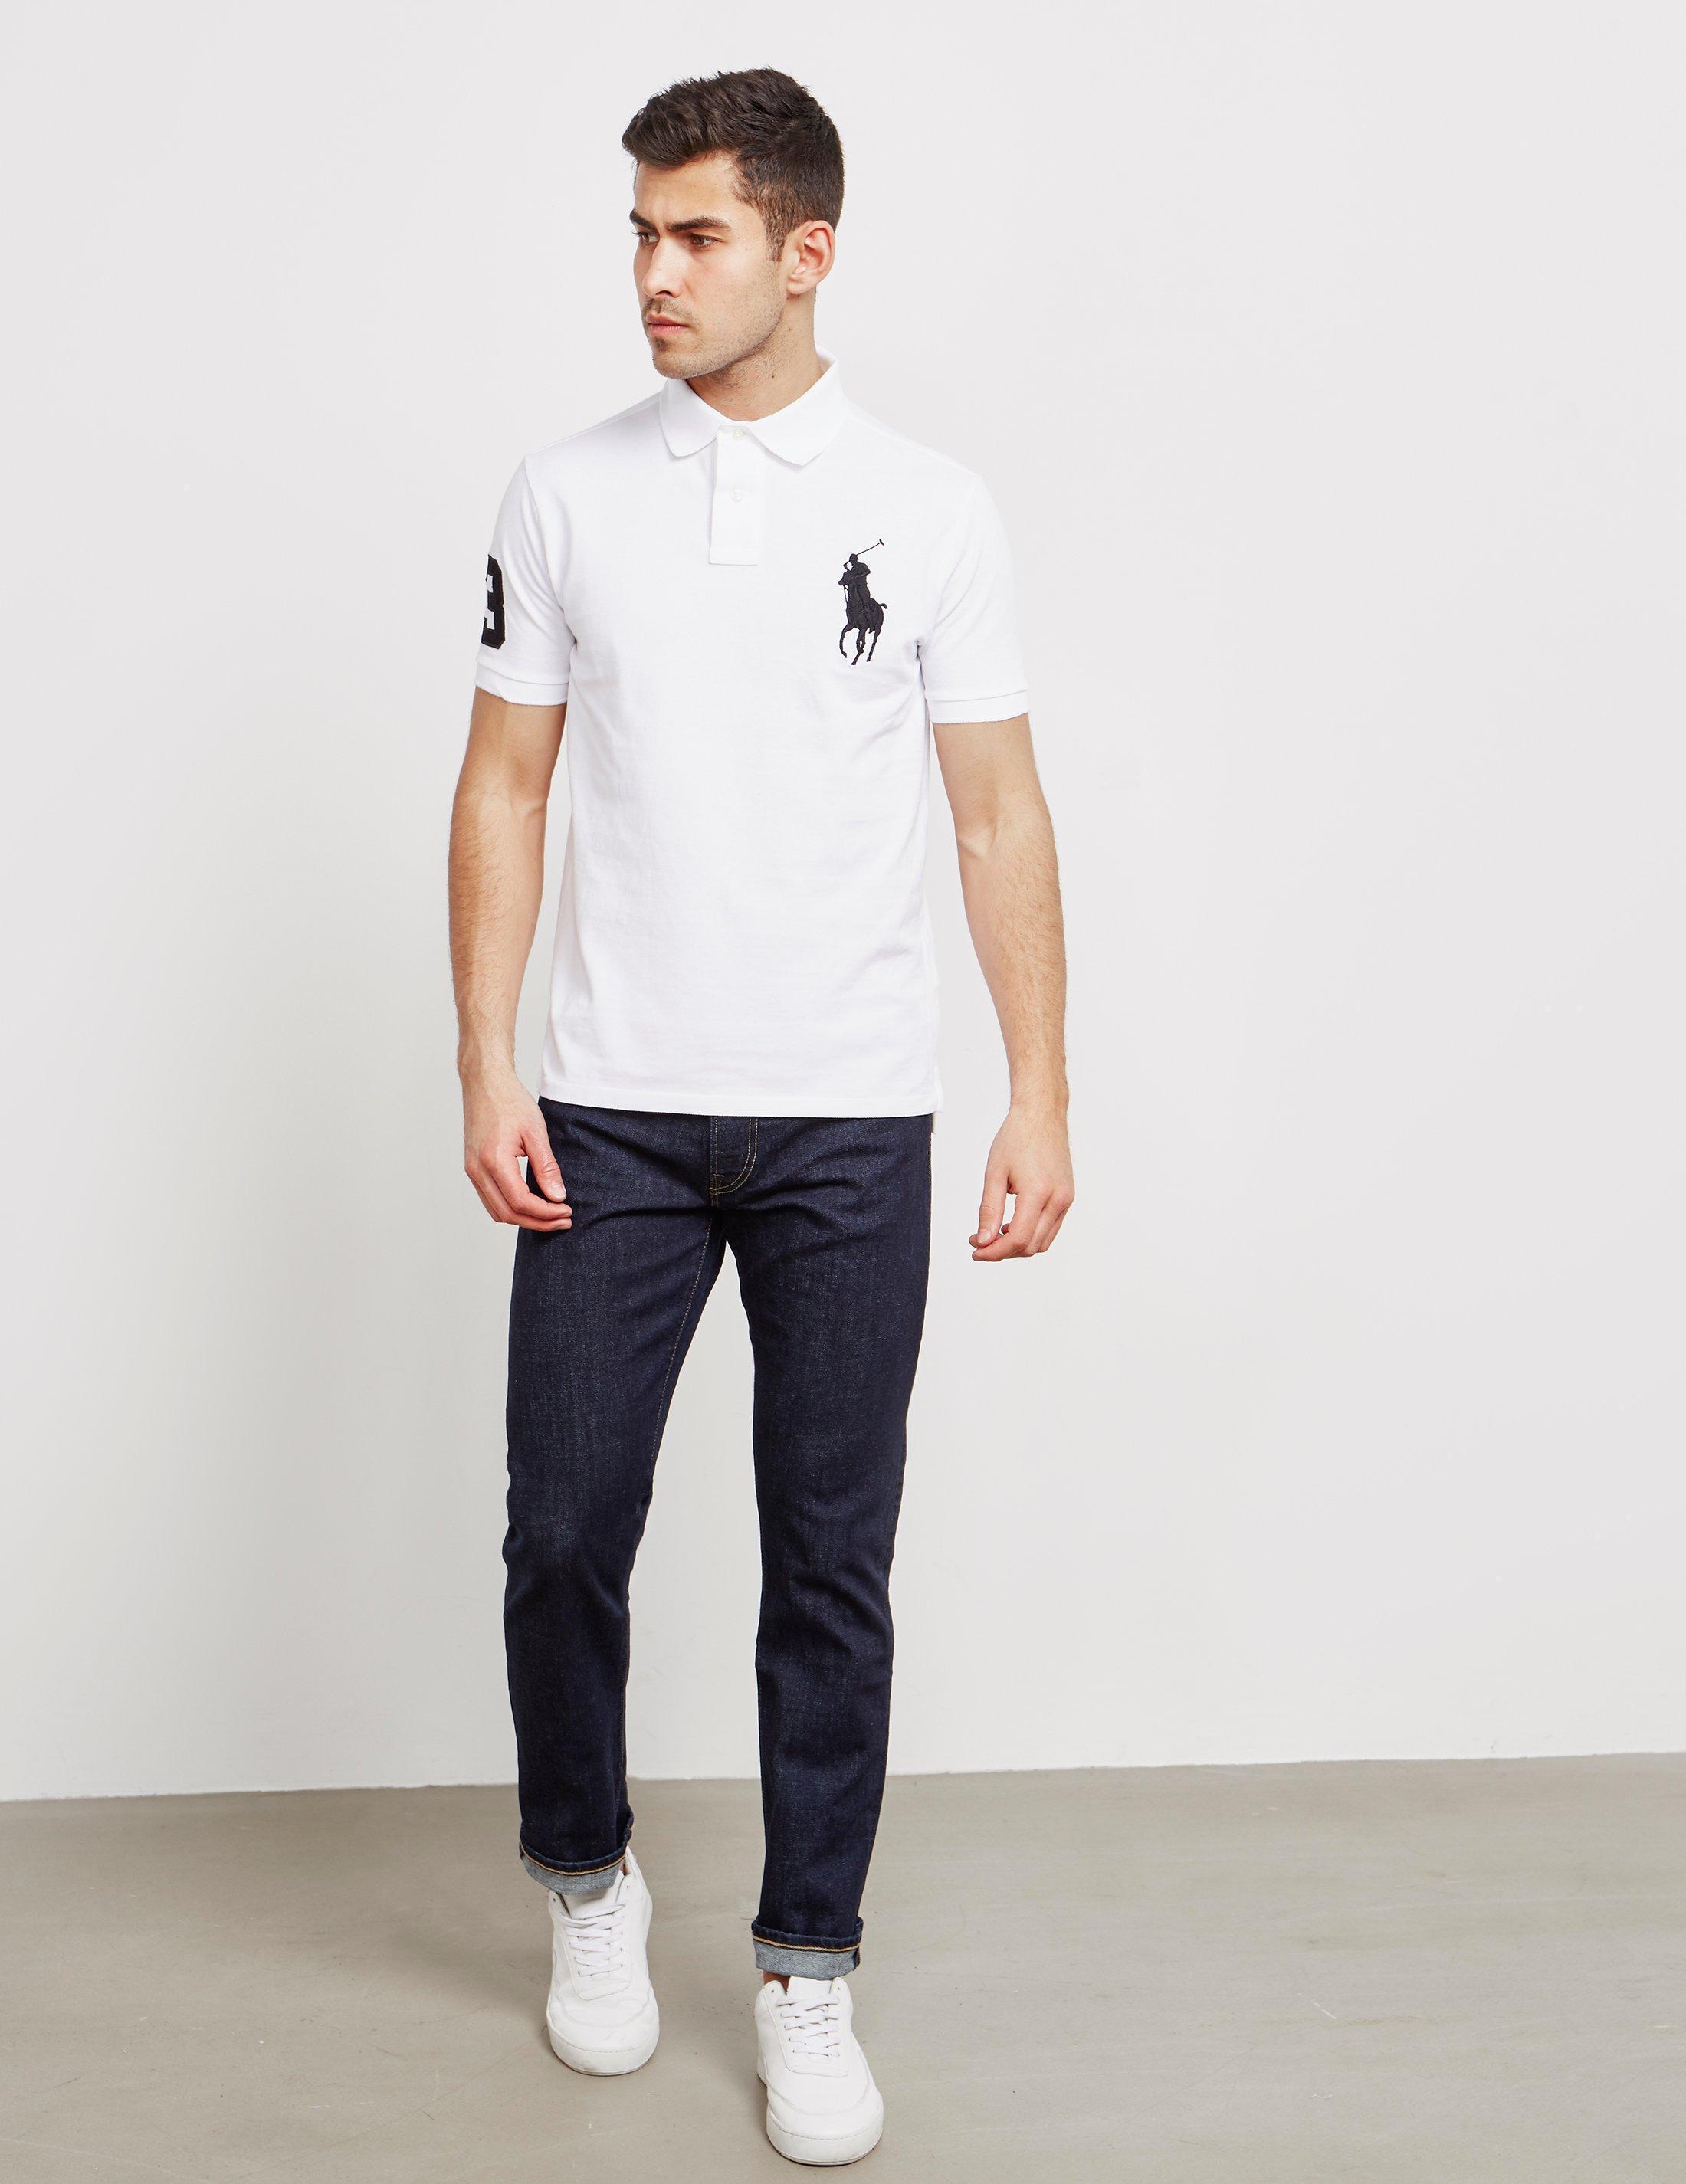 06d22f36100b Lyst - Polo Ralph Lauren Mens Large Embroidered Logo Short Sleeve Polo  Shirt White in White for Men